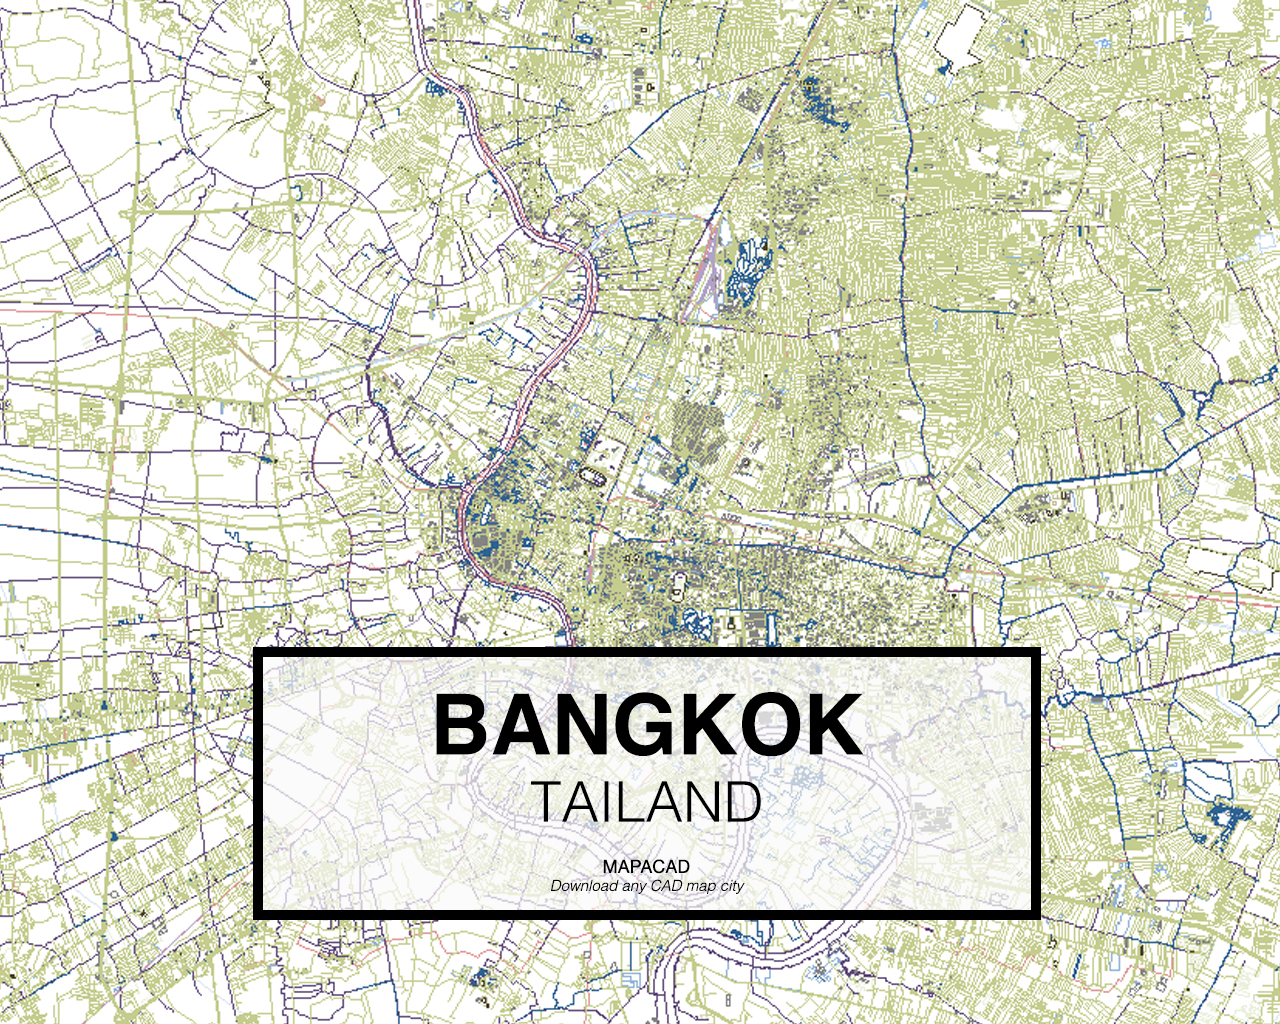 Download bangkok dwg mapacad bangkok tailand 01 mapacad download map cad dwg gumiabroncs Image collections